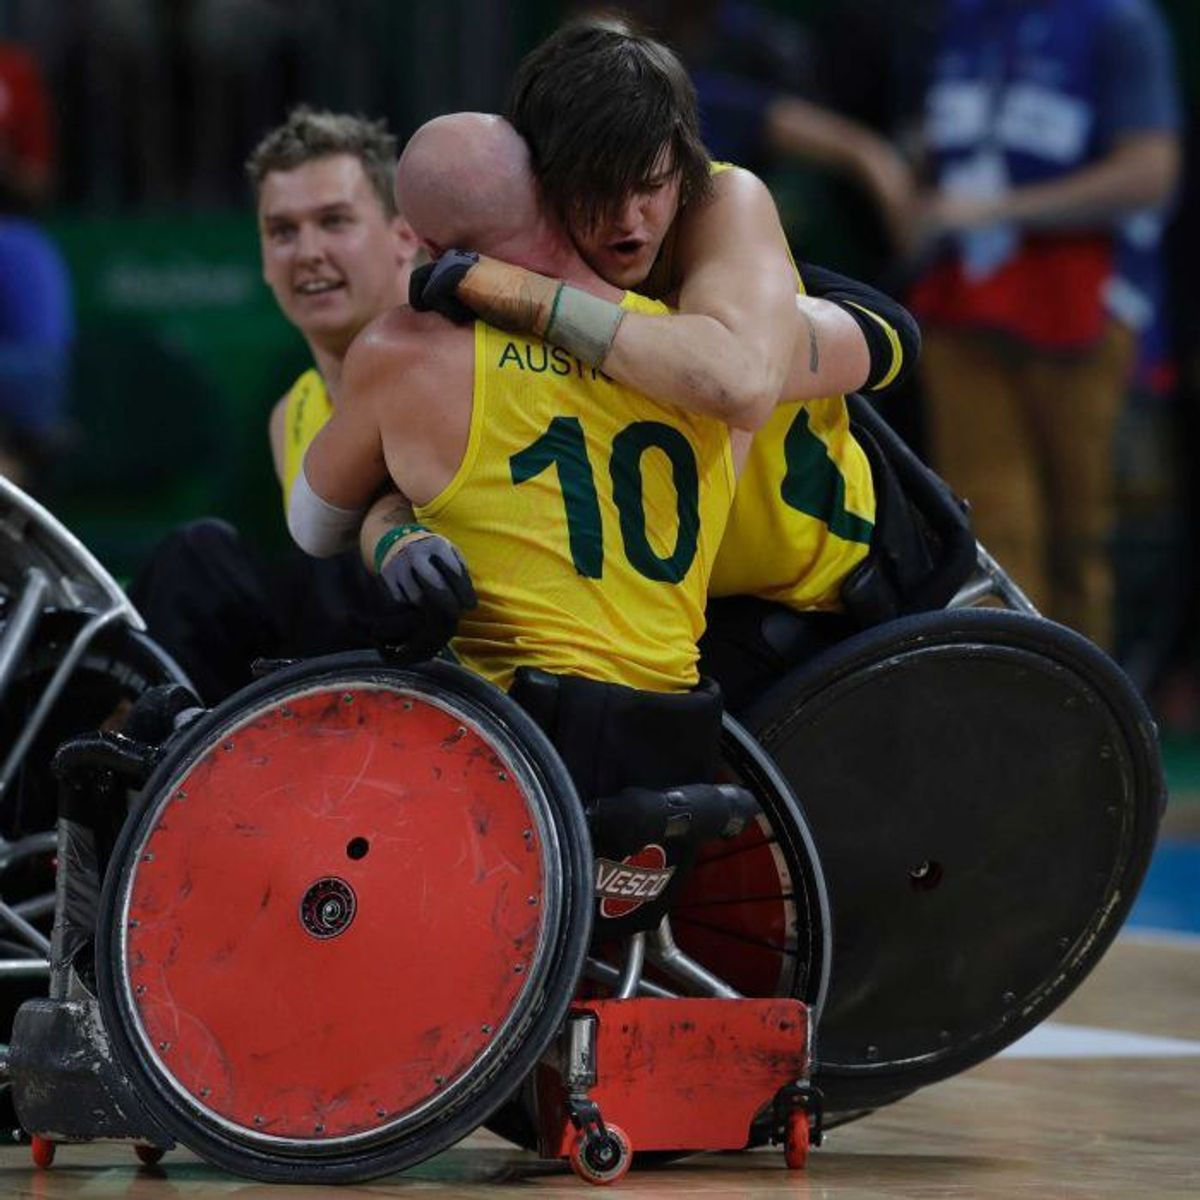 Australia Overcomes Team USA In Wild Wheelchair Rugby Final